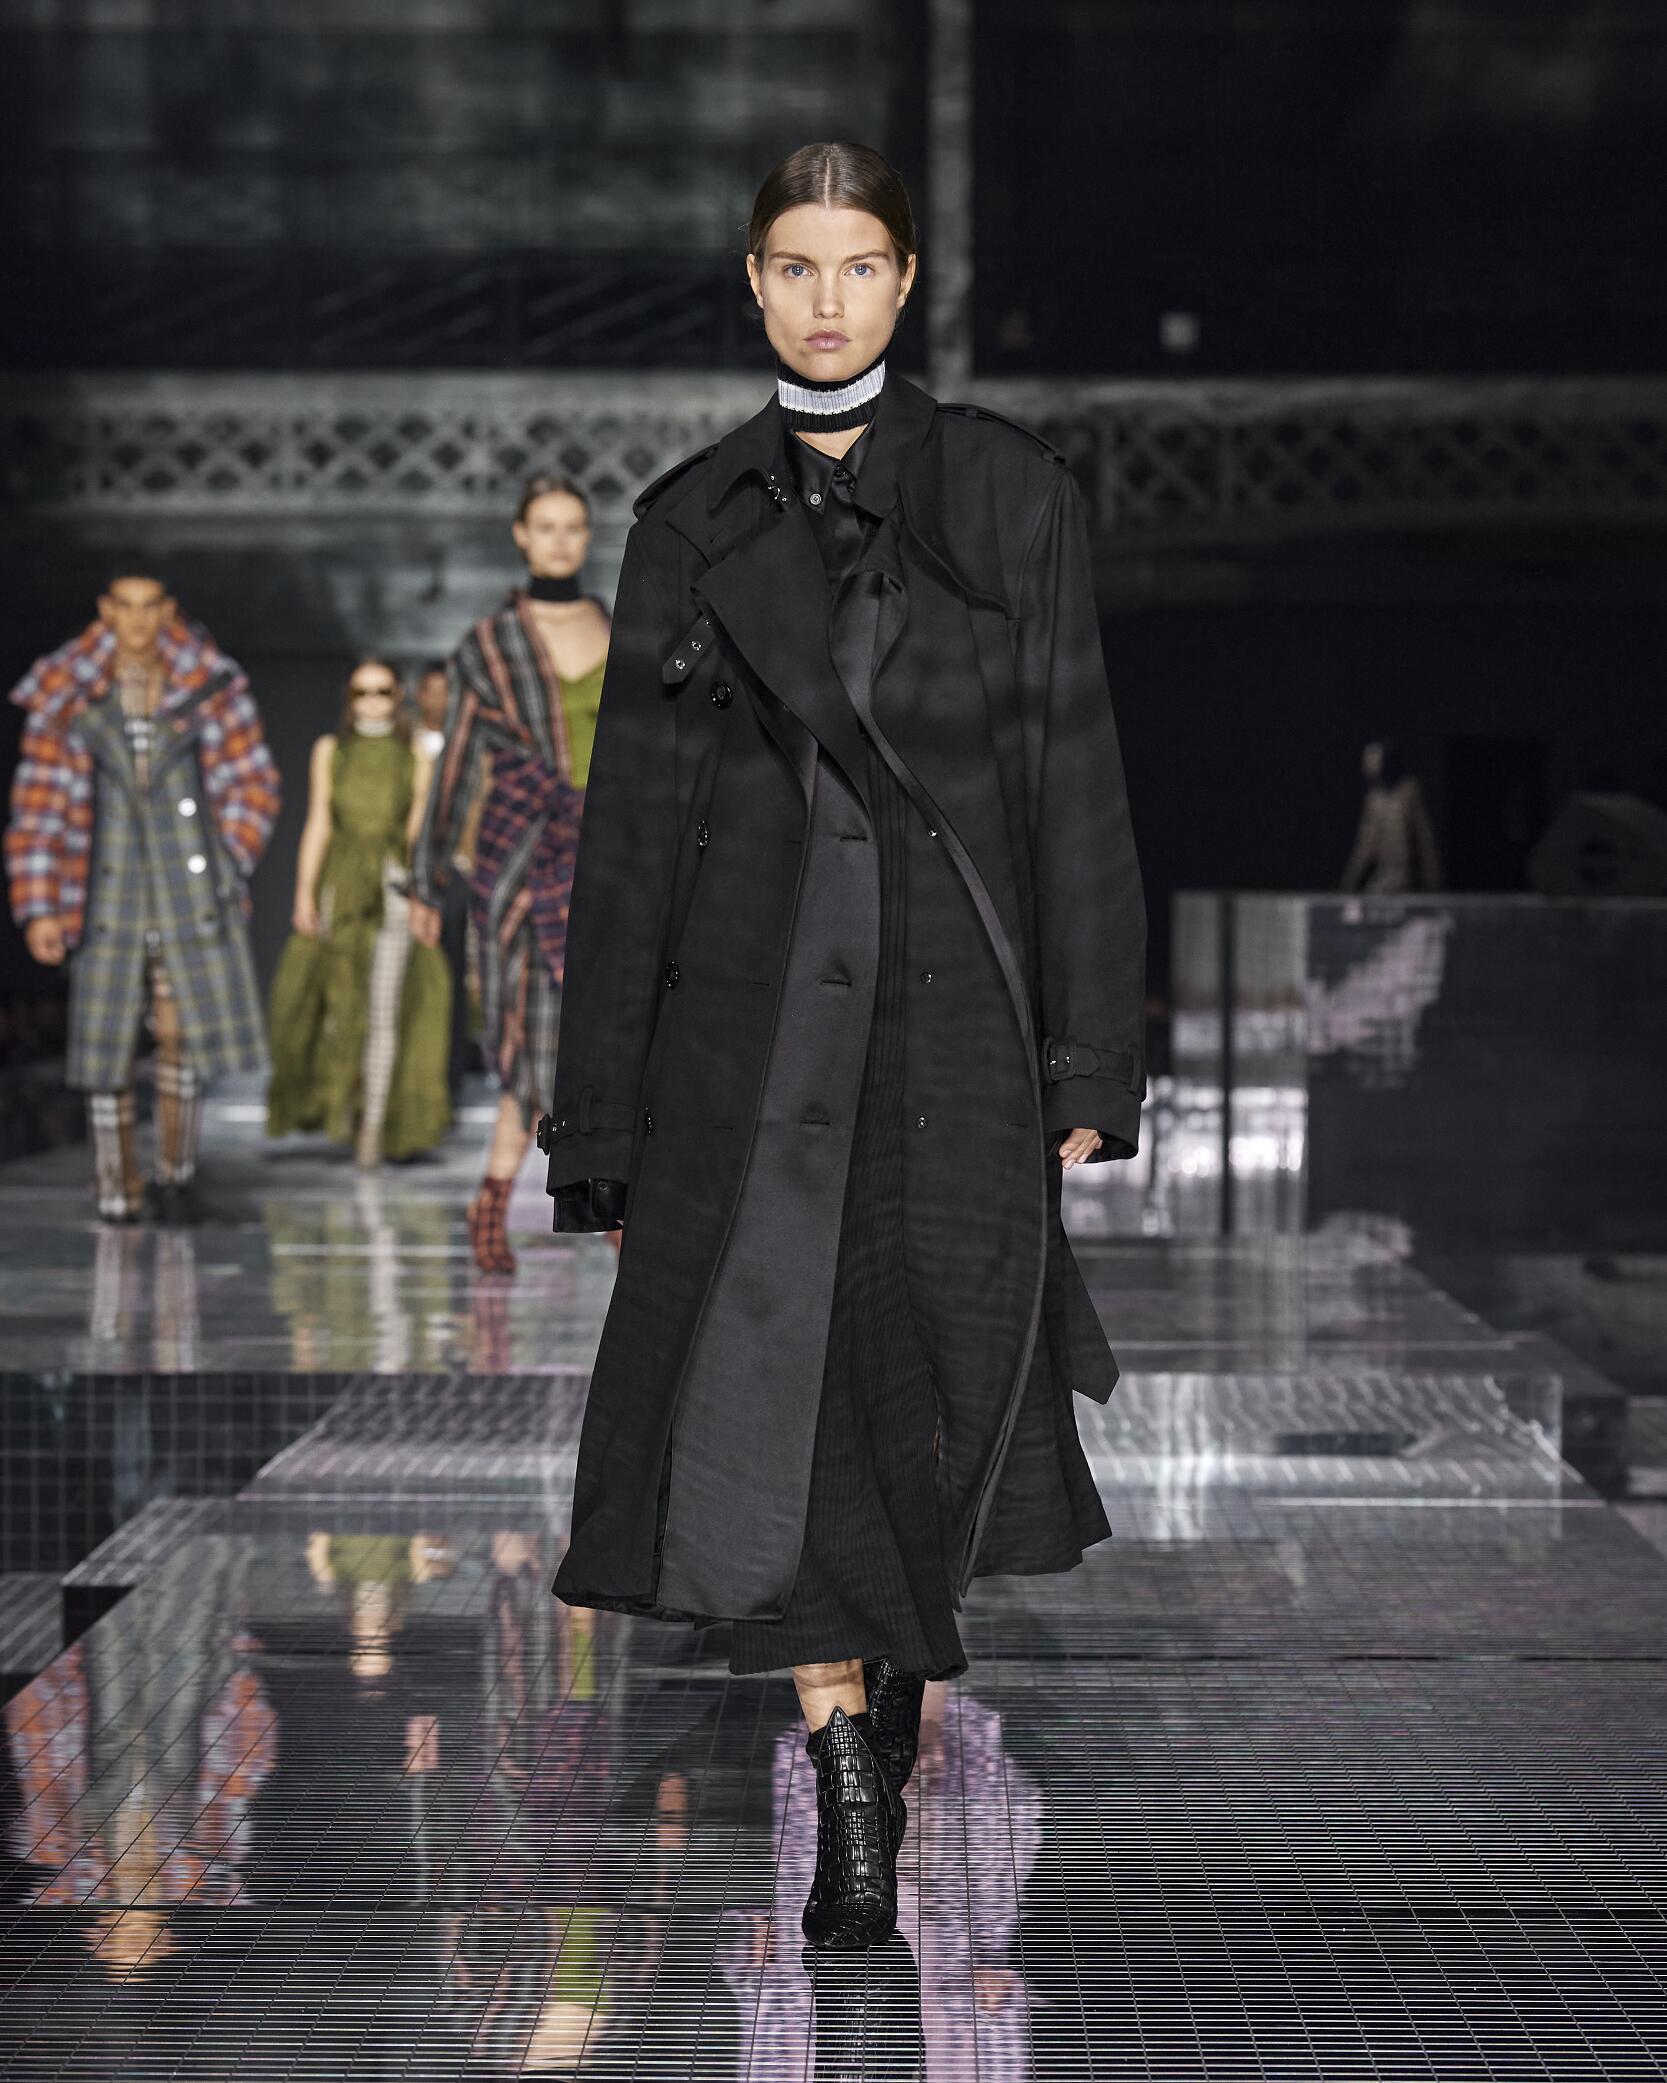 FW 2020 Burberry Show London Fashion Week Womenswear